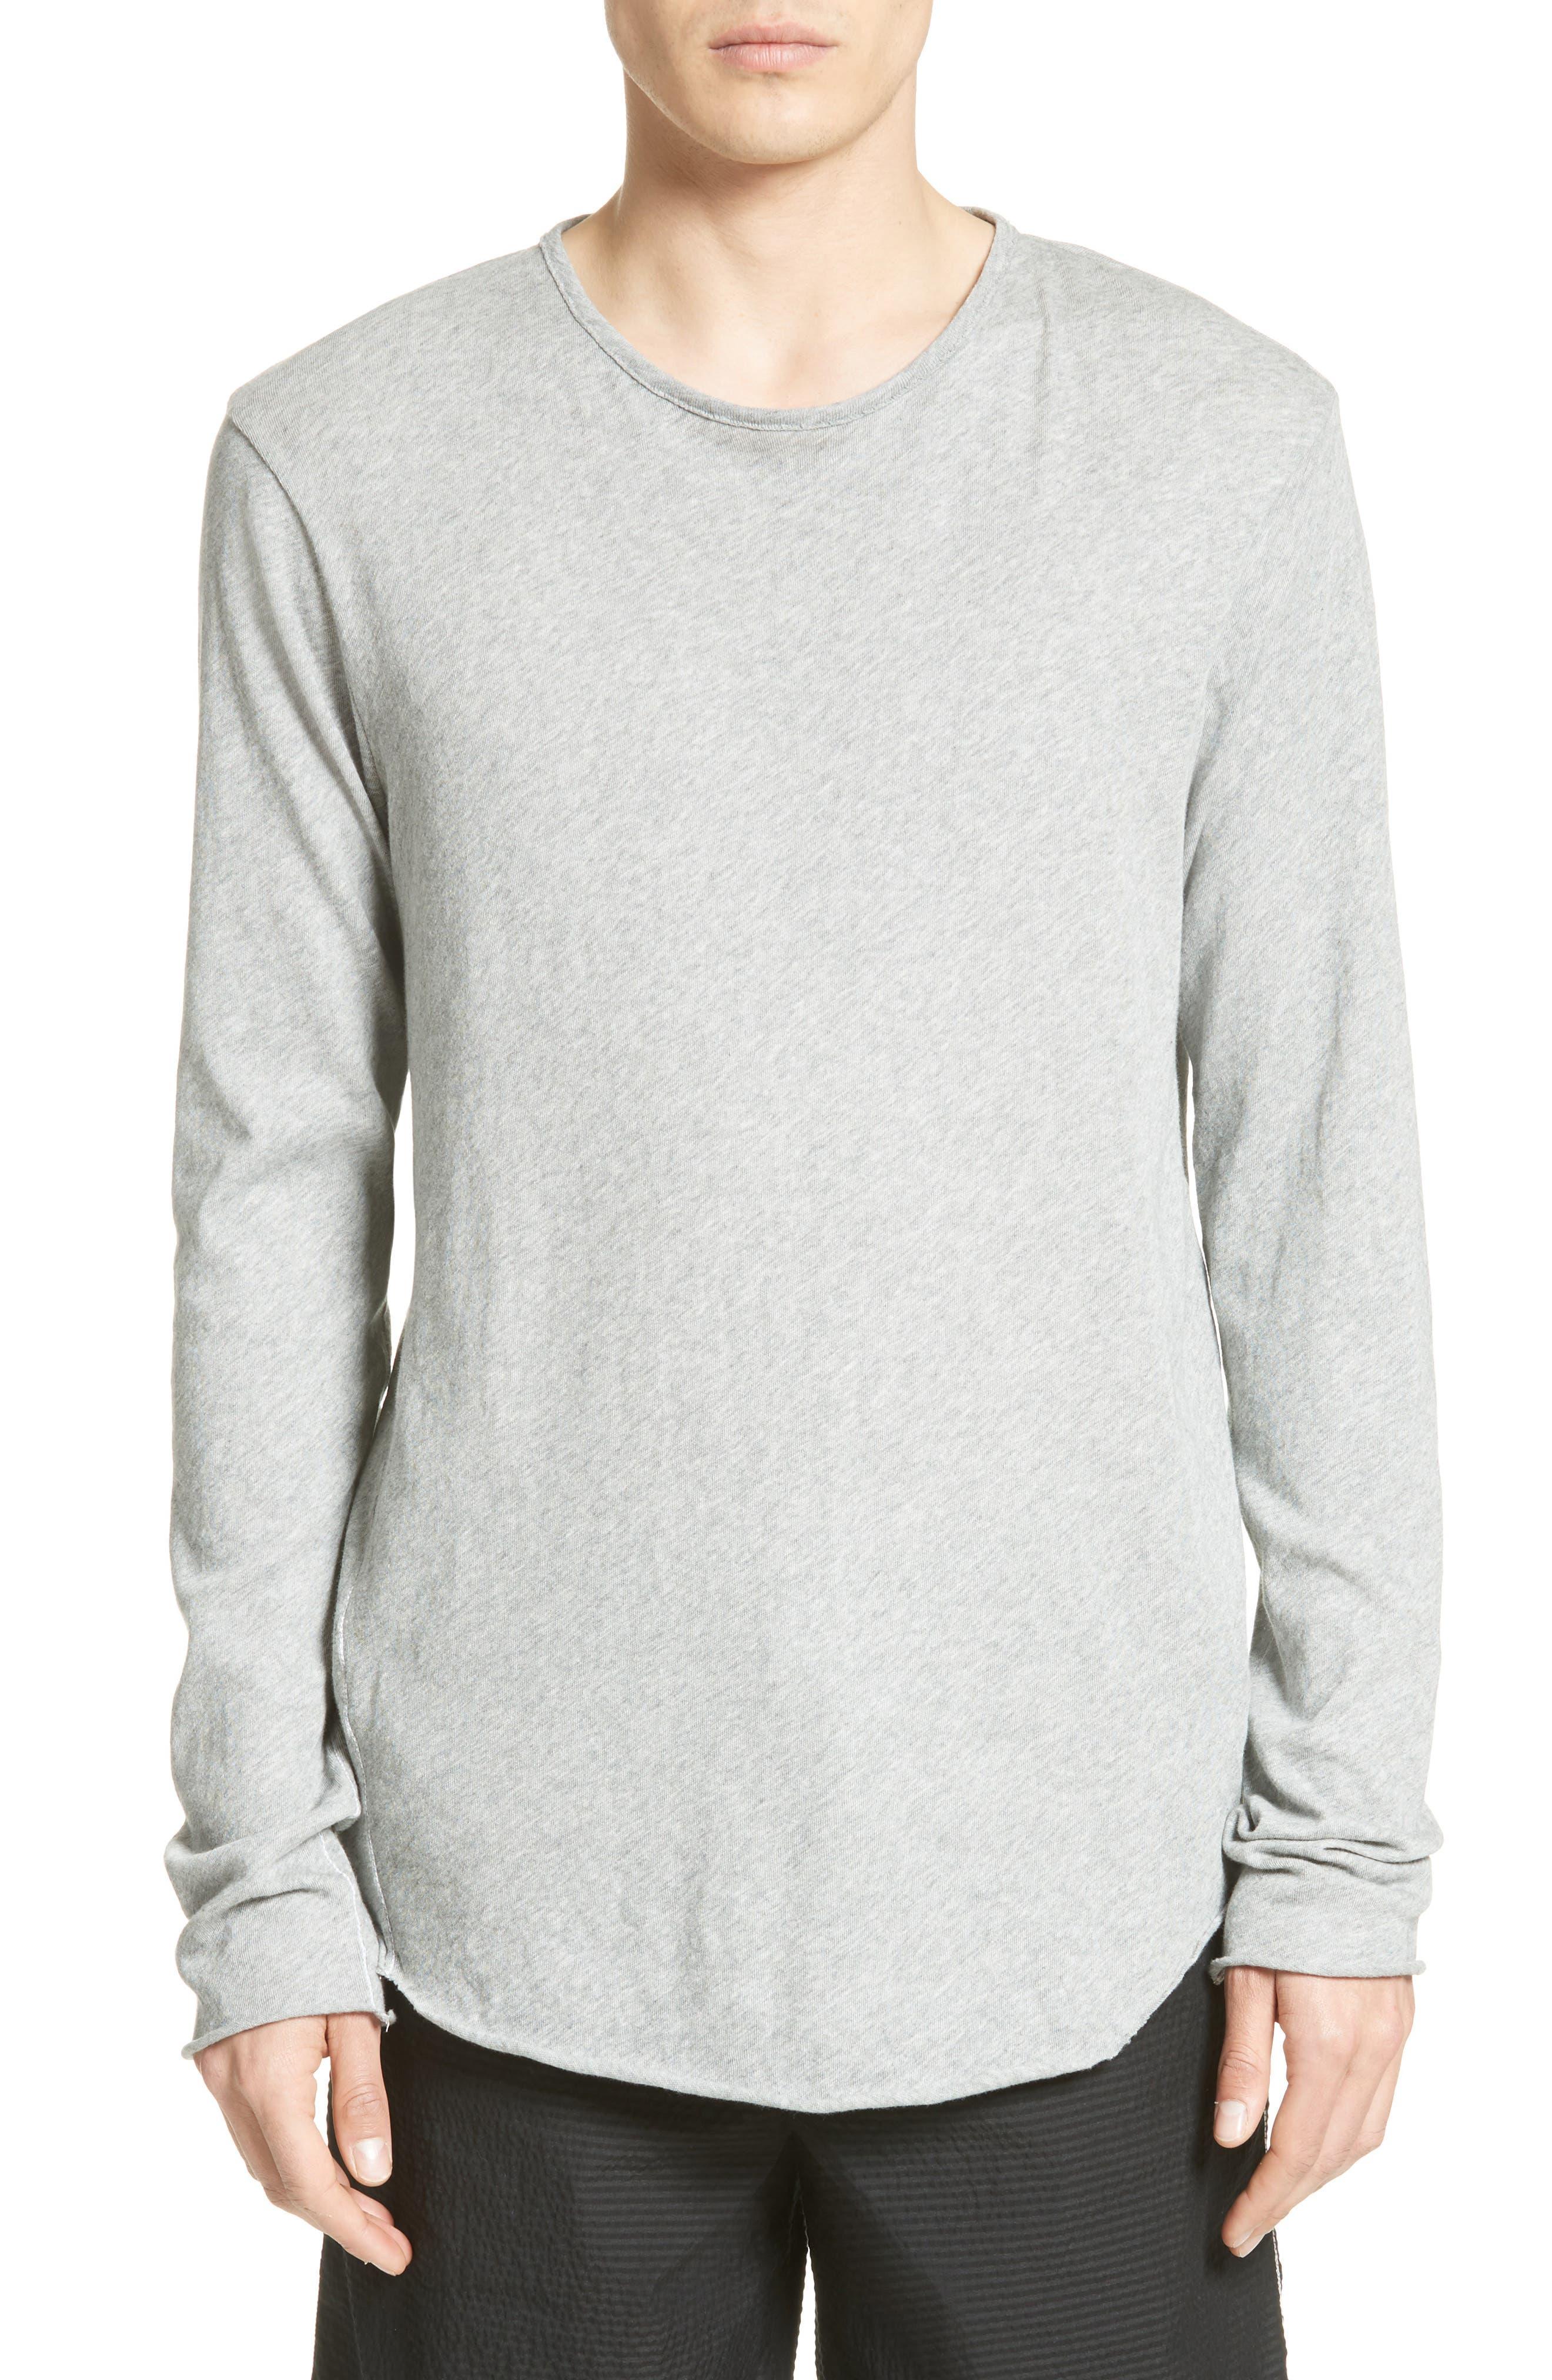 Hartley Cotton & Linen T-Shirt,                             Main thumbnail 1, color,                             034